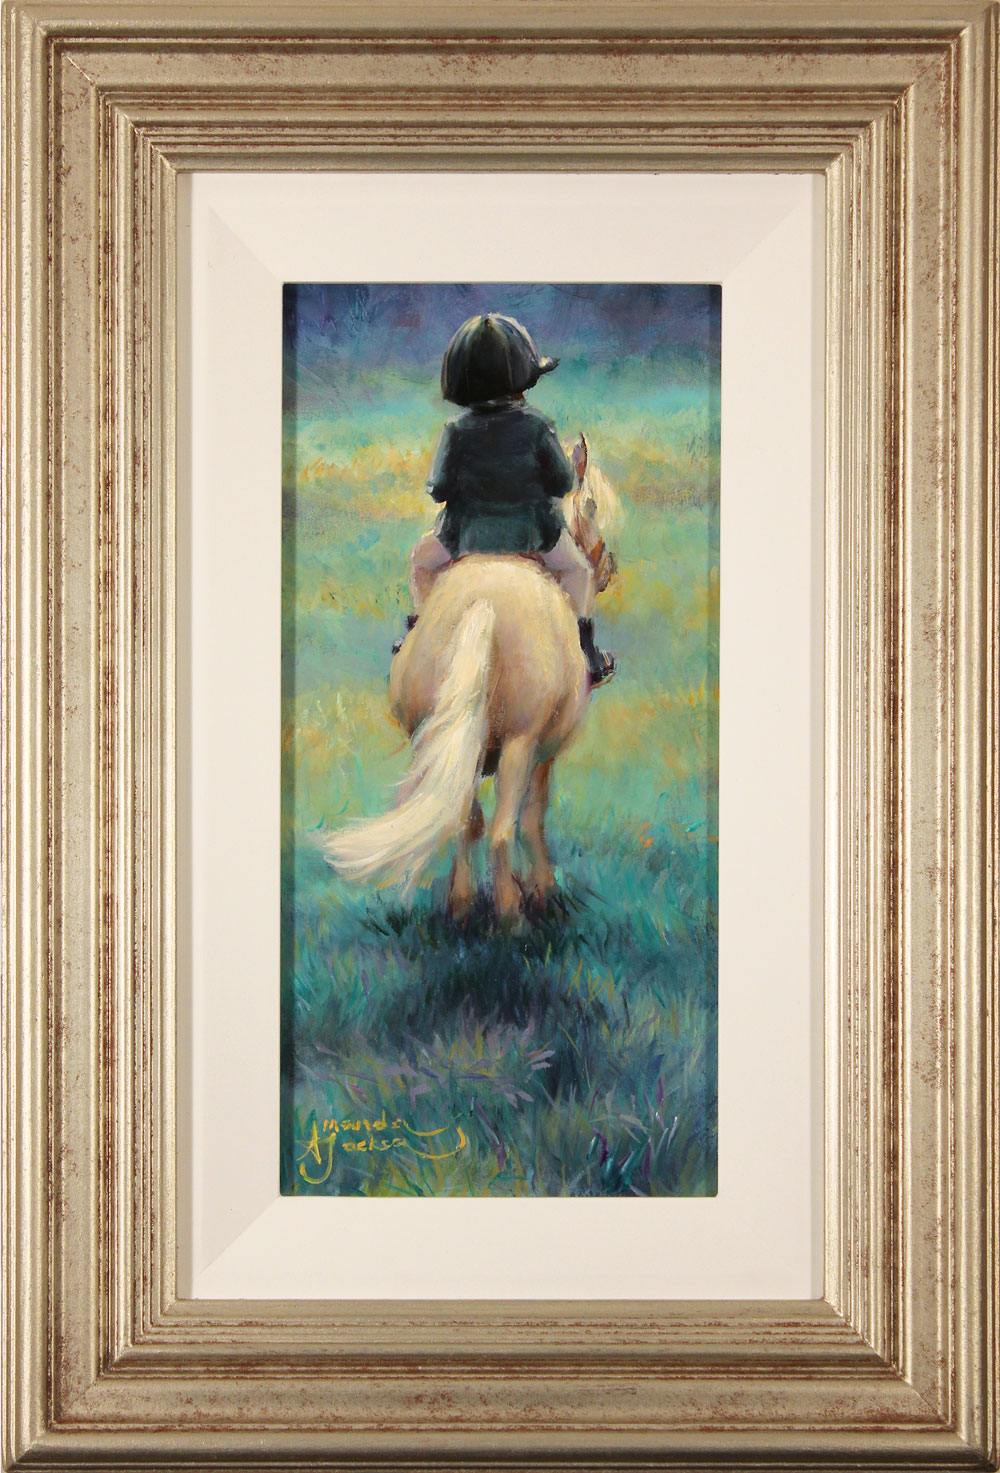 Amanda Jackson, Original oil painting on panel, My Little Pony Click to enlarge